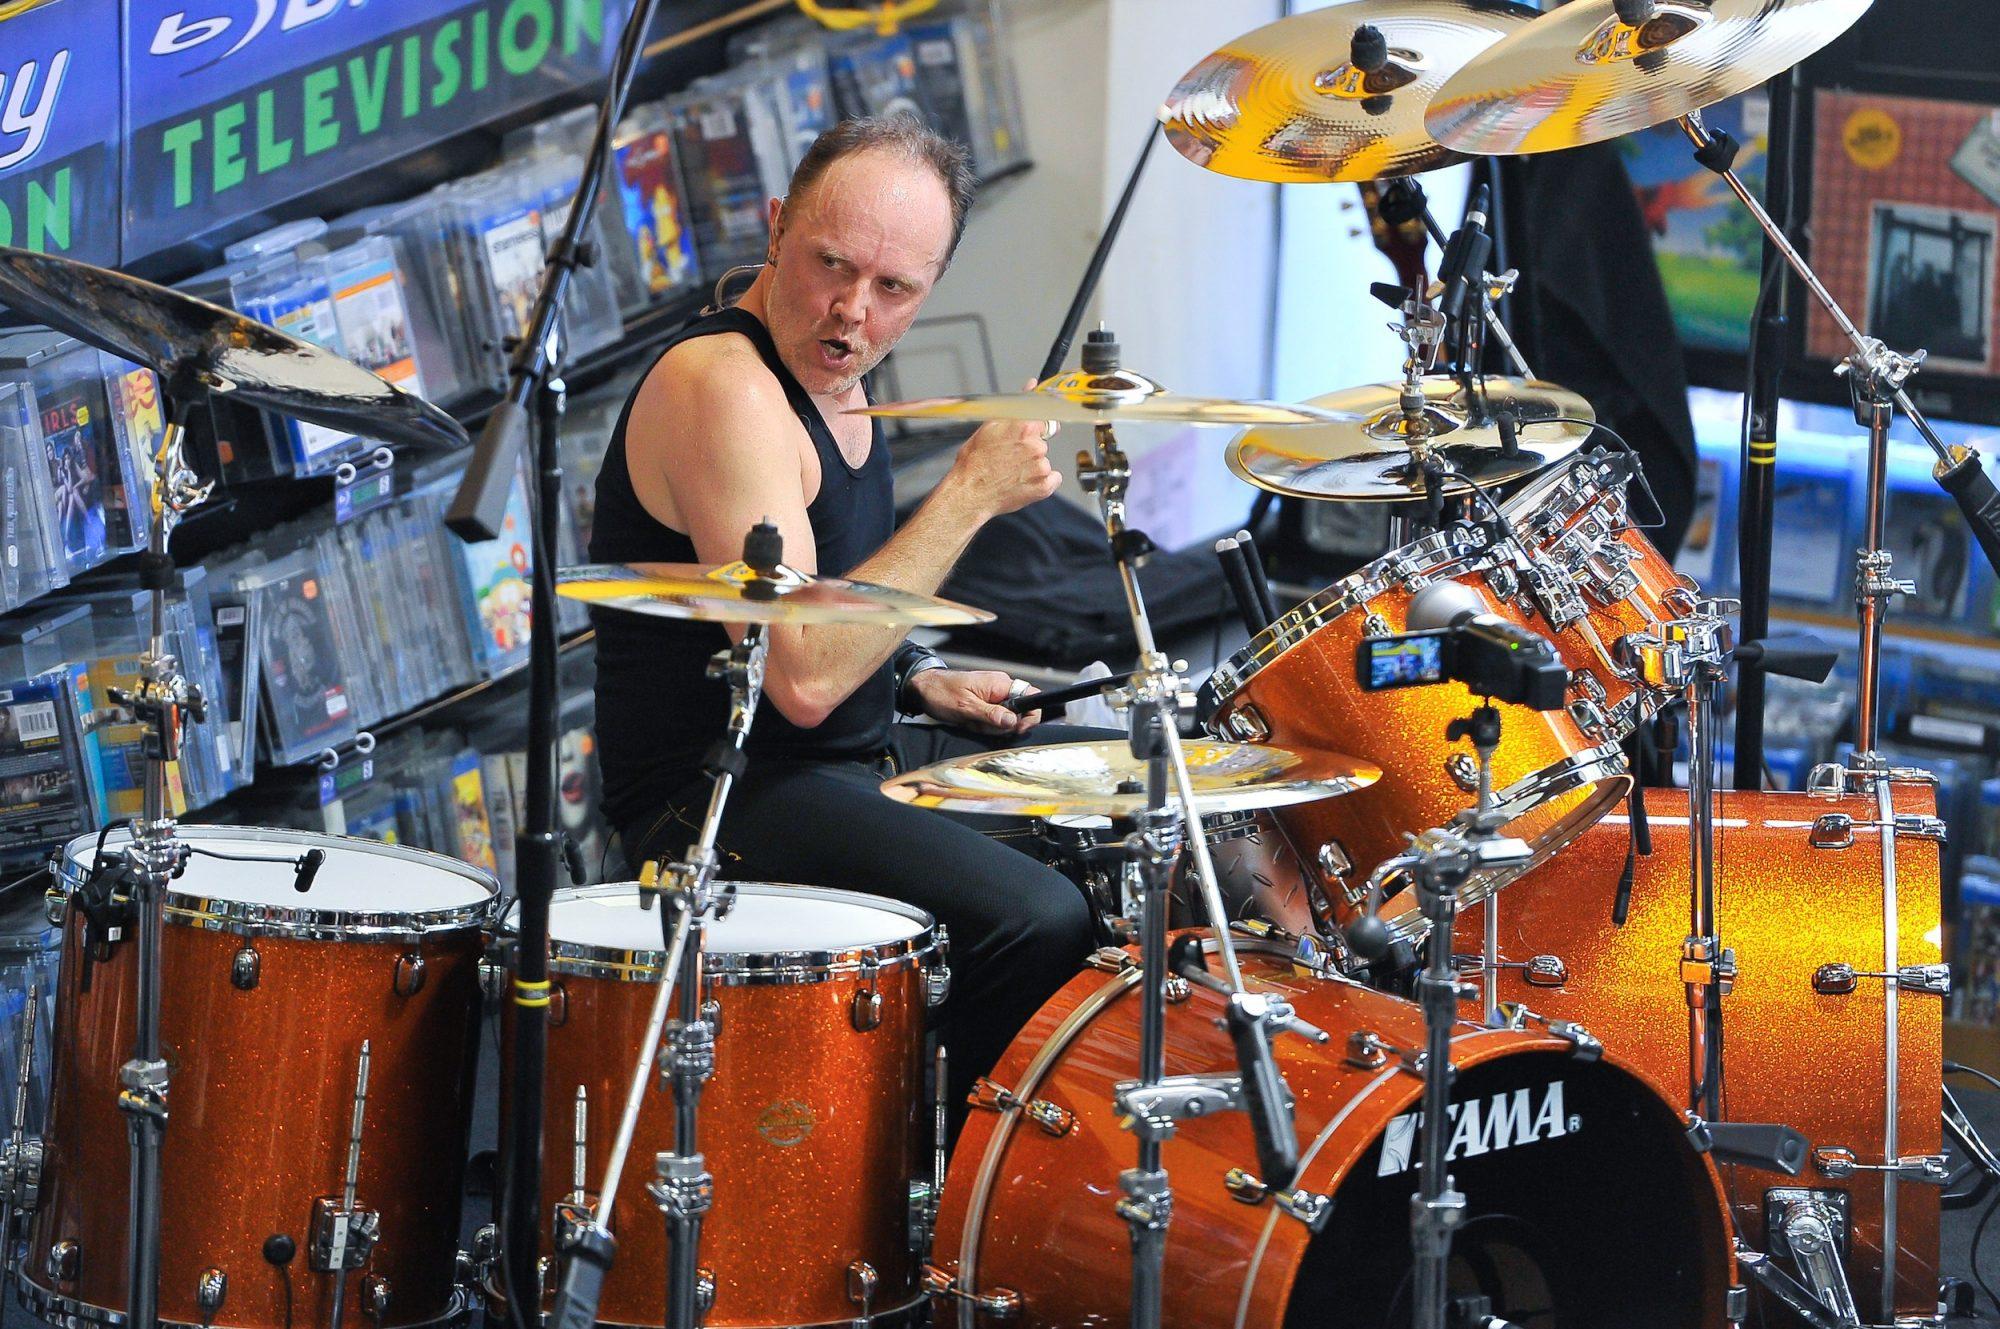 EC: Metallica's Lars Ulrich Eats About 20 Pancakes a Day